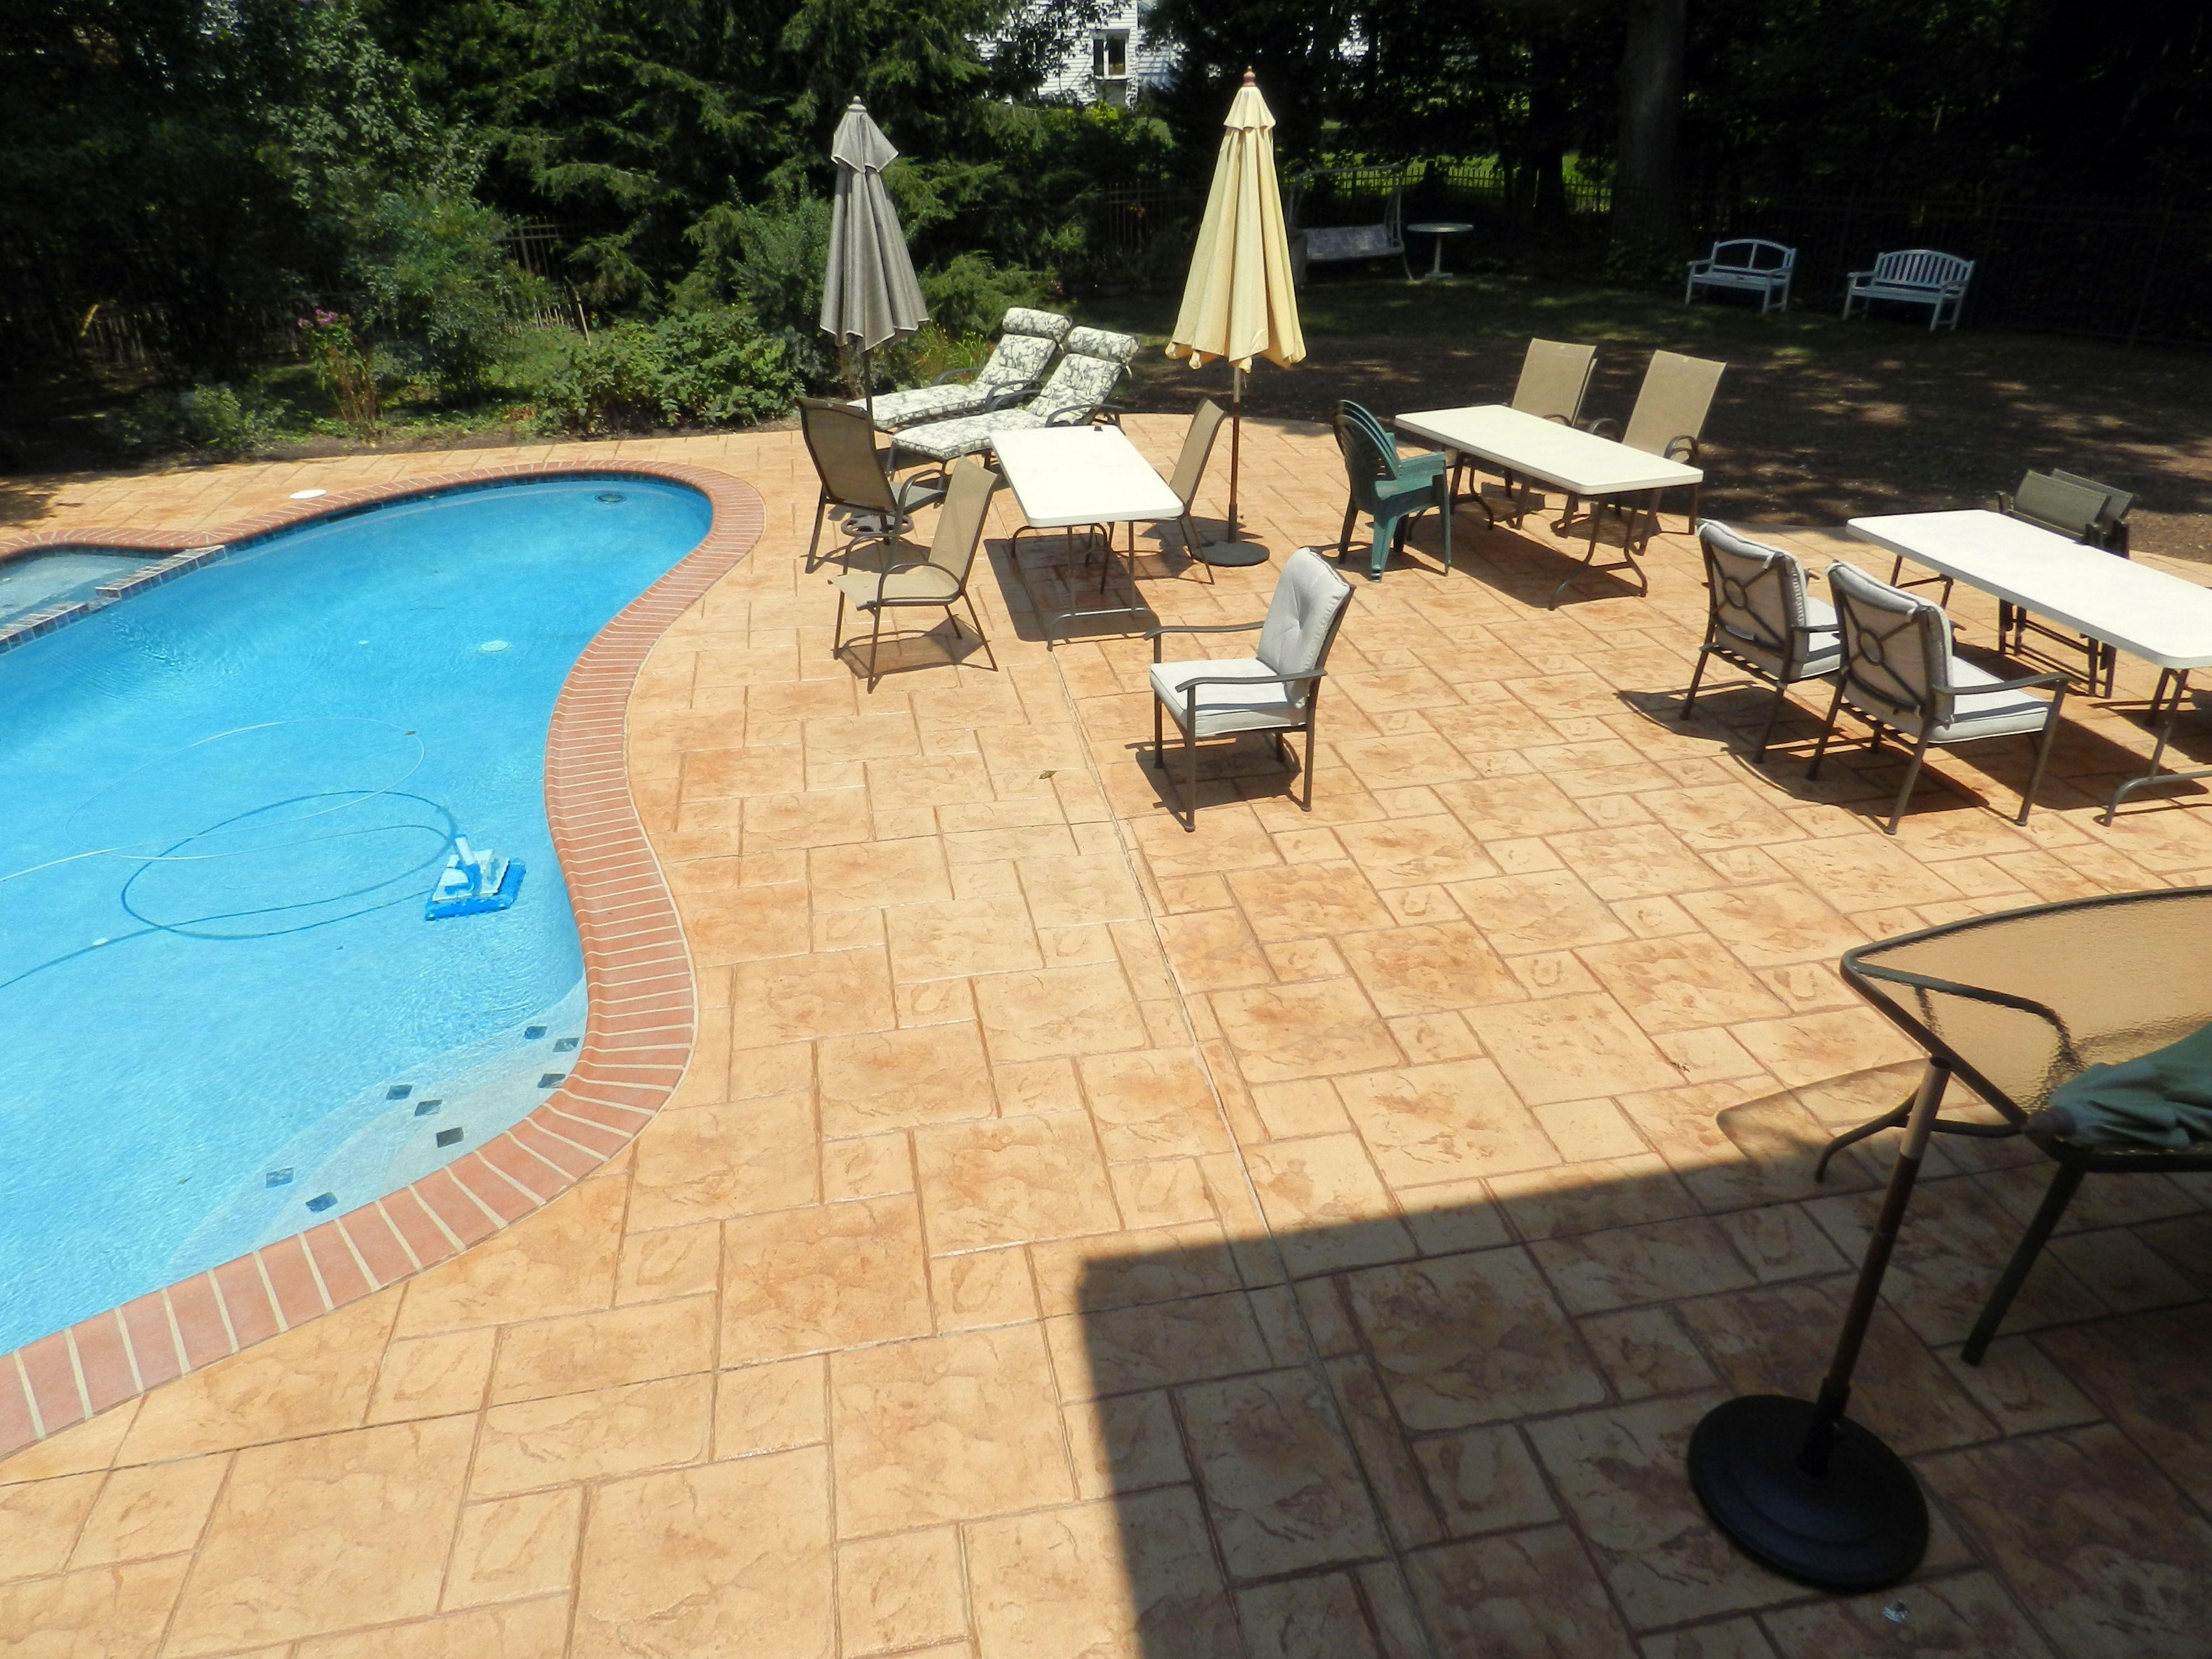 Stamped Concrete Pool Deck - Opa Locka Pattern. | Stamped Concrete ...